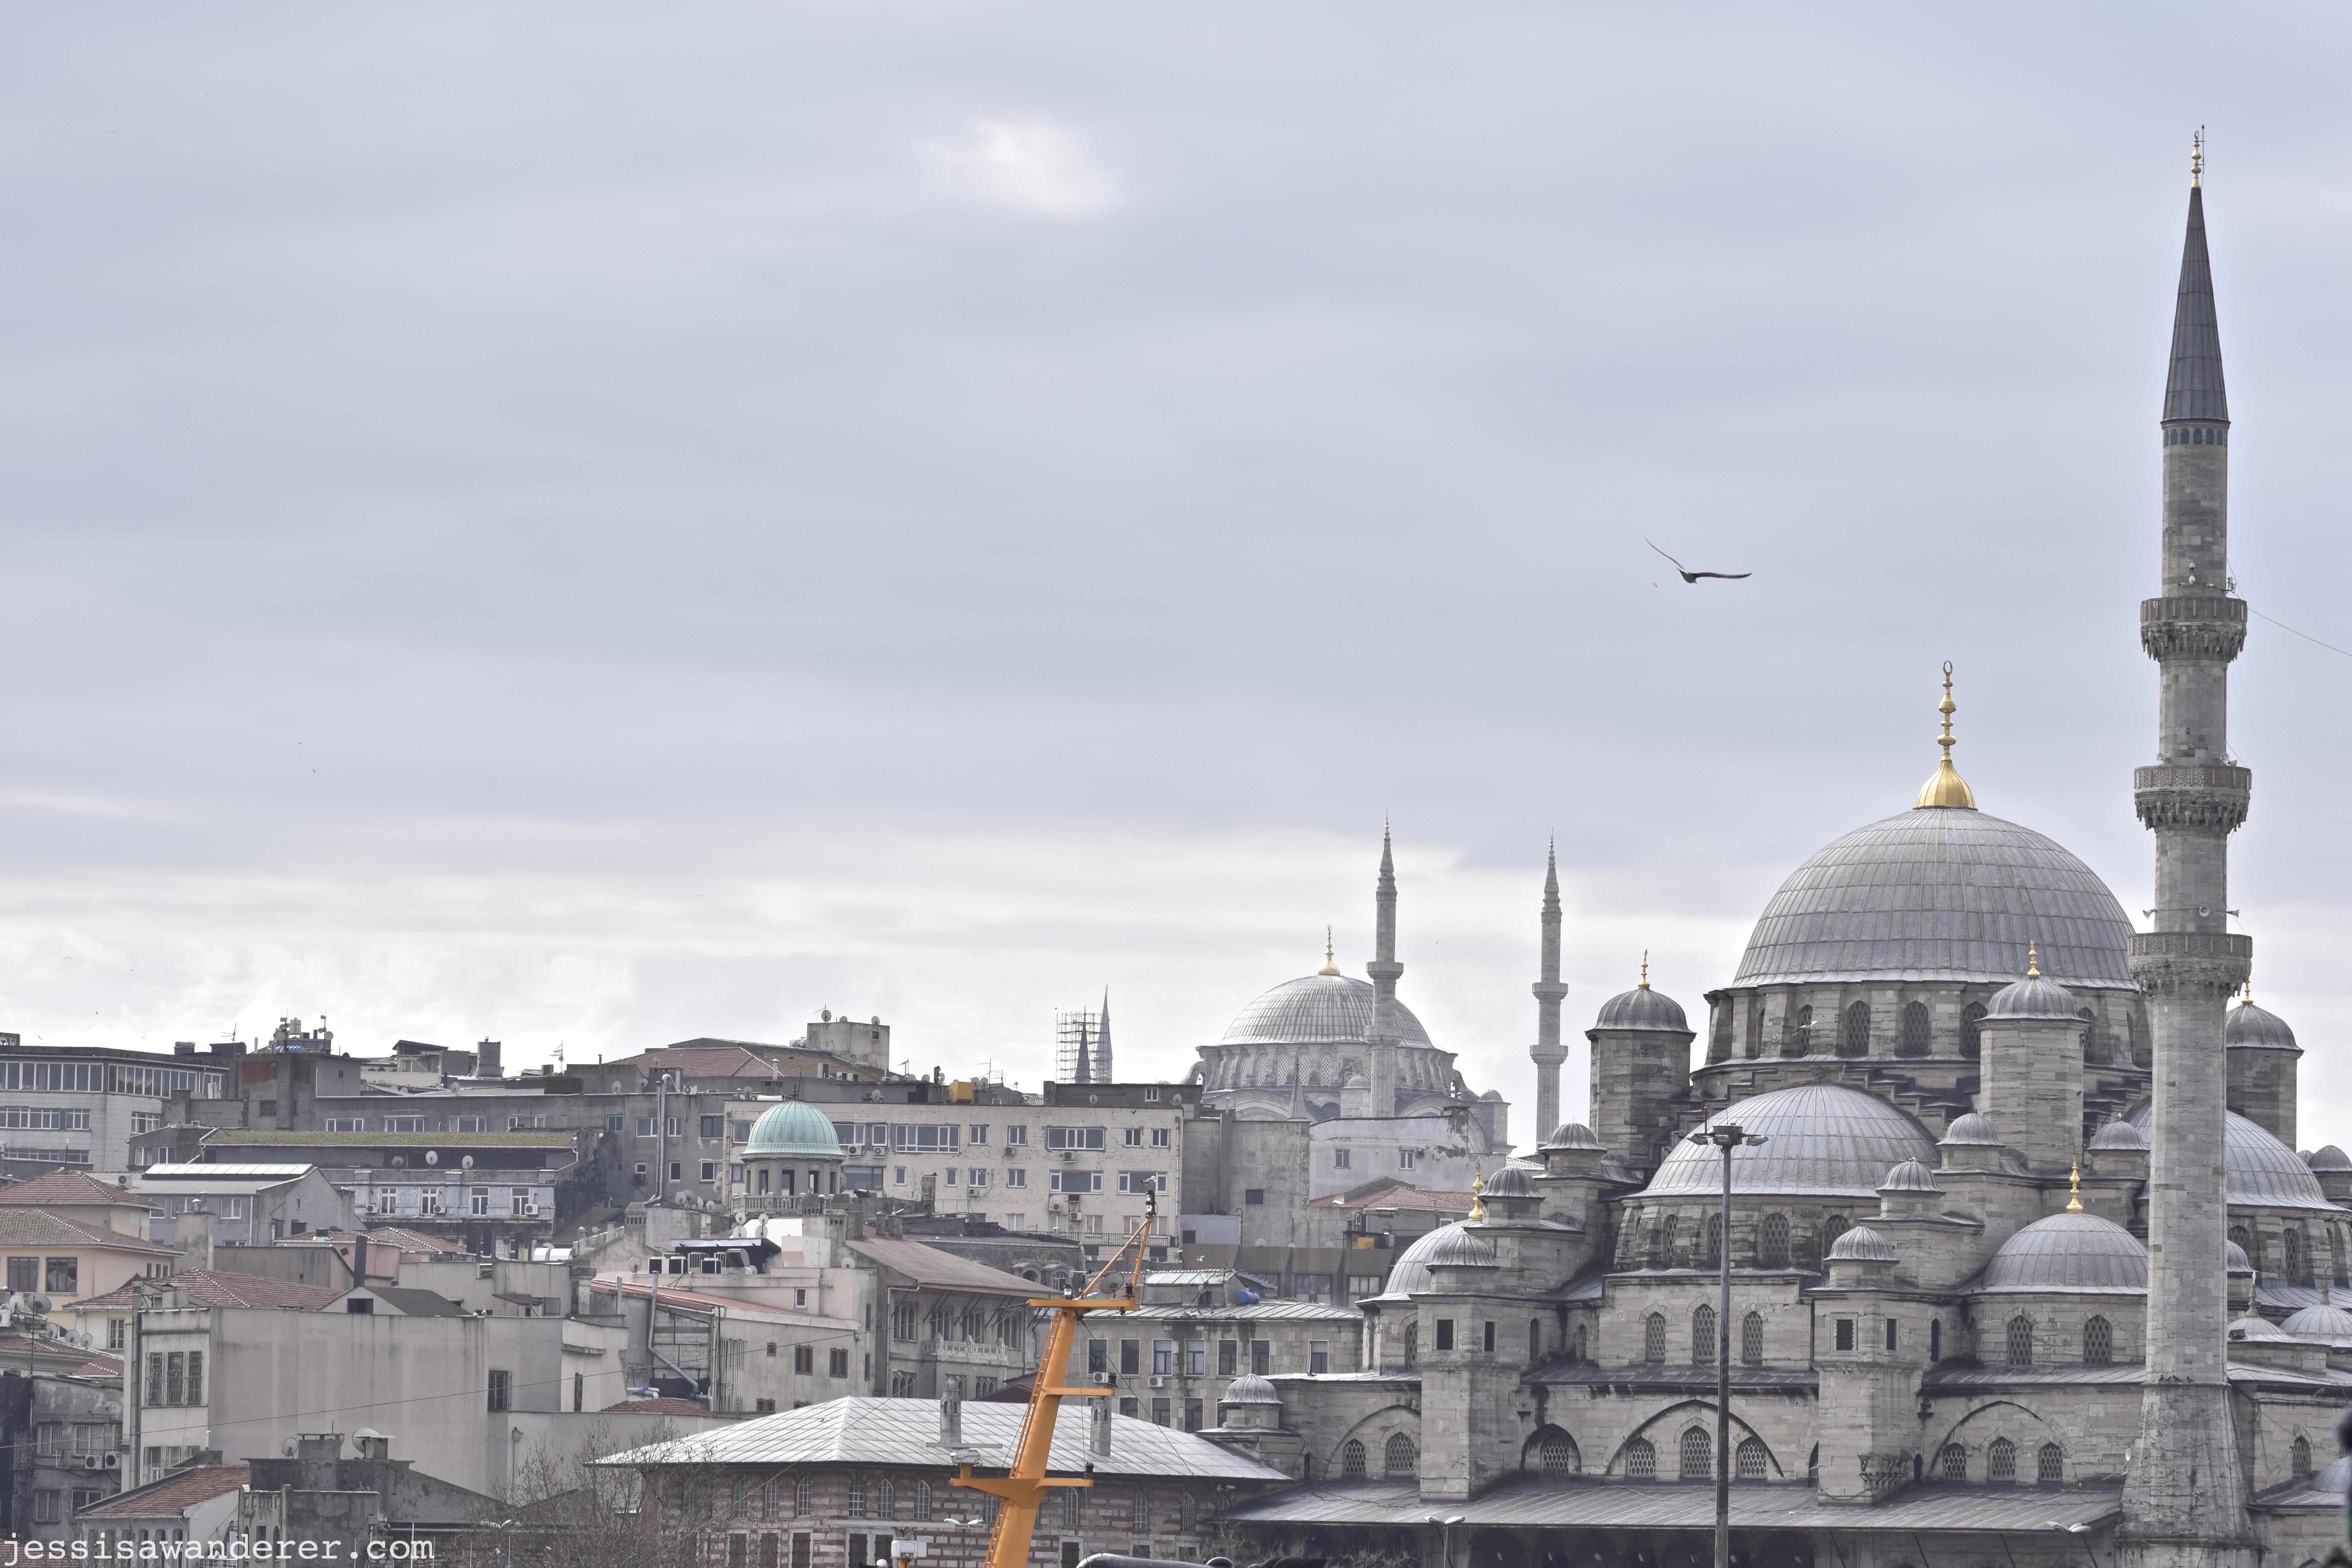 Distant Minarets